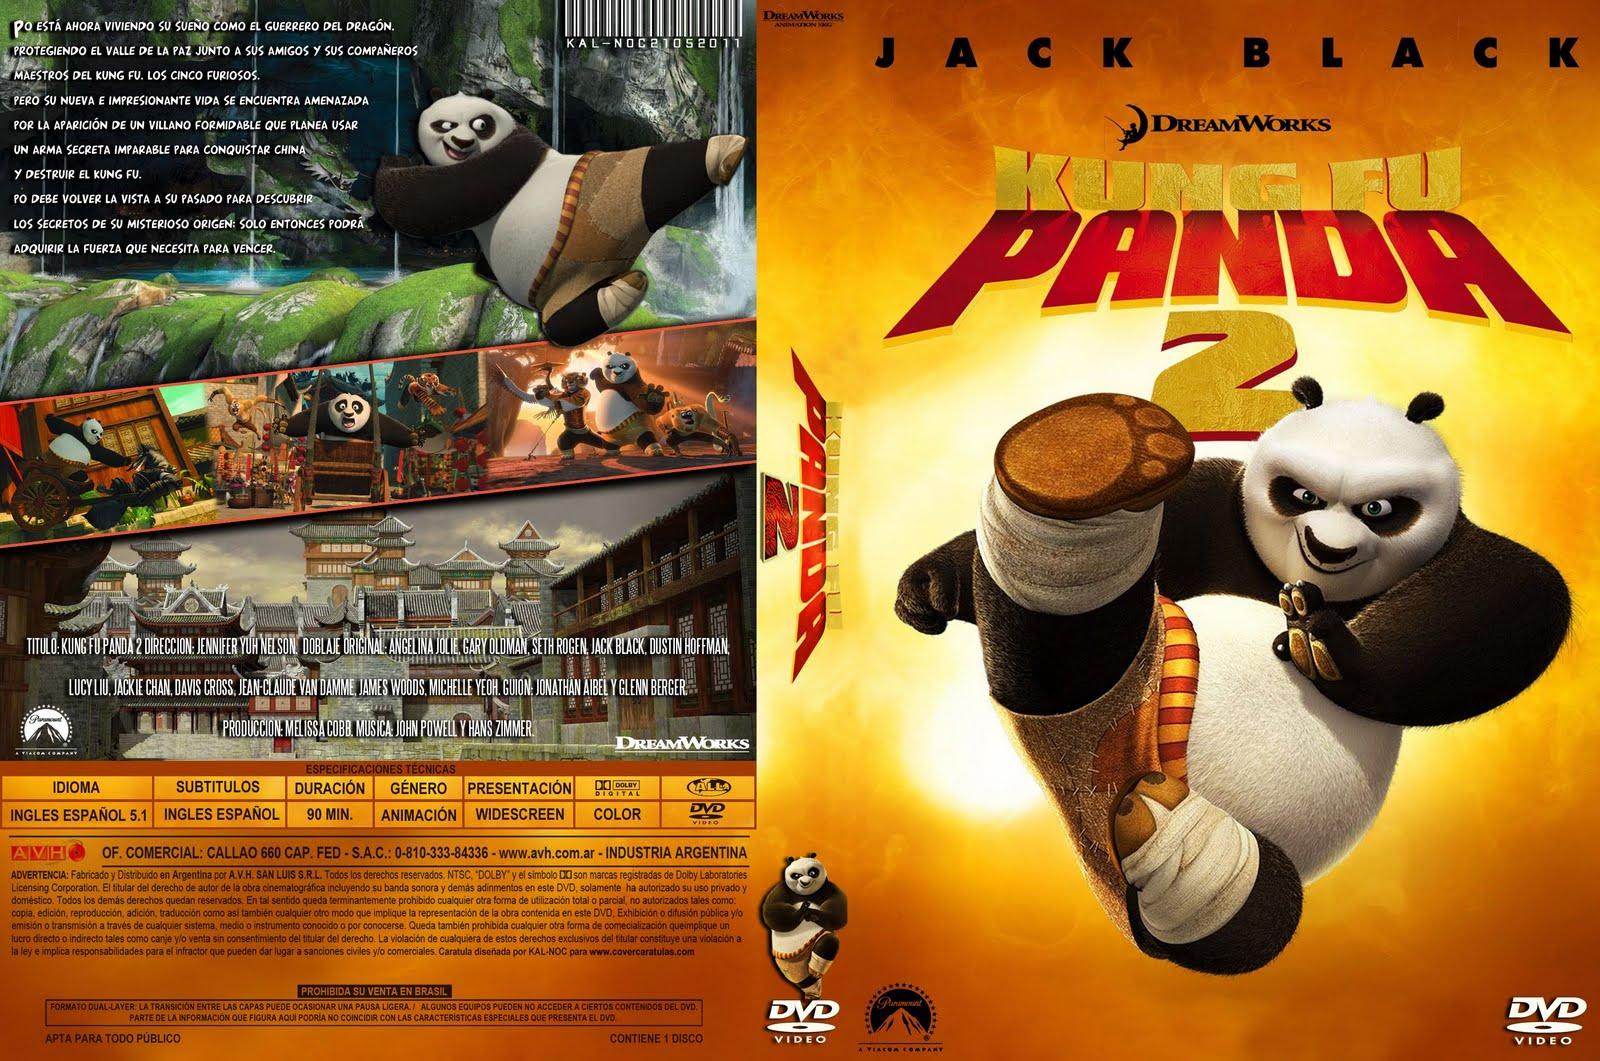 http://1.bp.blogspot.com/-17djHAsrwr0/Tq9H9WL-N4I/AAAAAAAADjw/Bzk0f8n_aCI/s1600/Kung_Fu_Panda_2_-_Custom_-_V2_por_kal-noc_%255Bdvd%255D_80.jpg